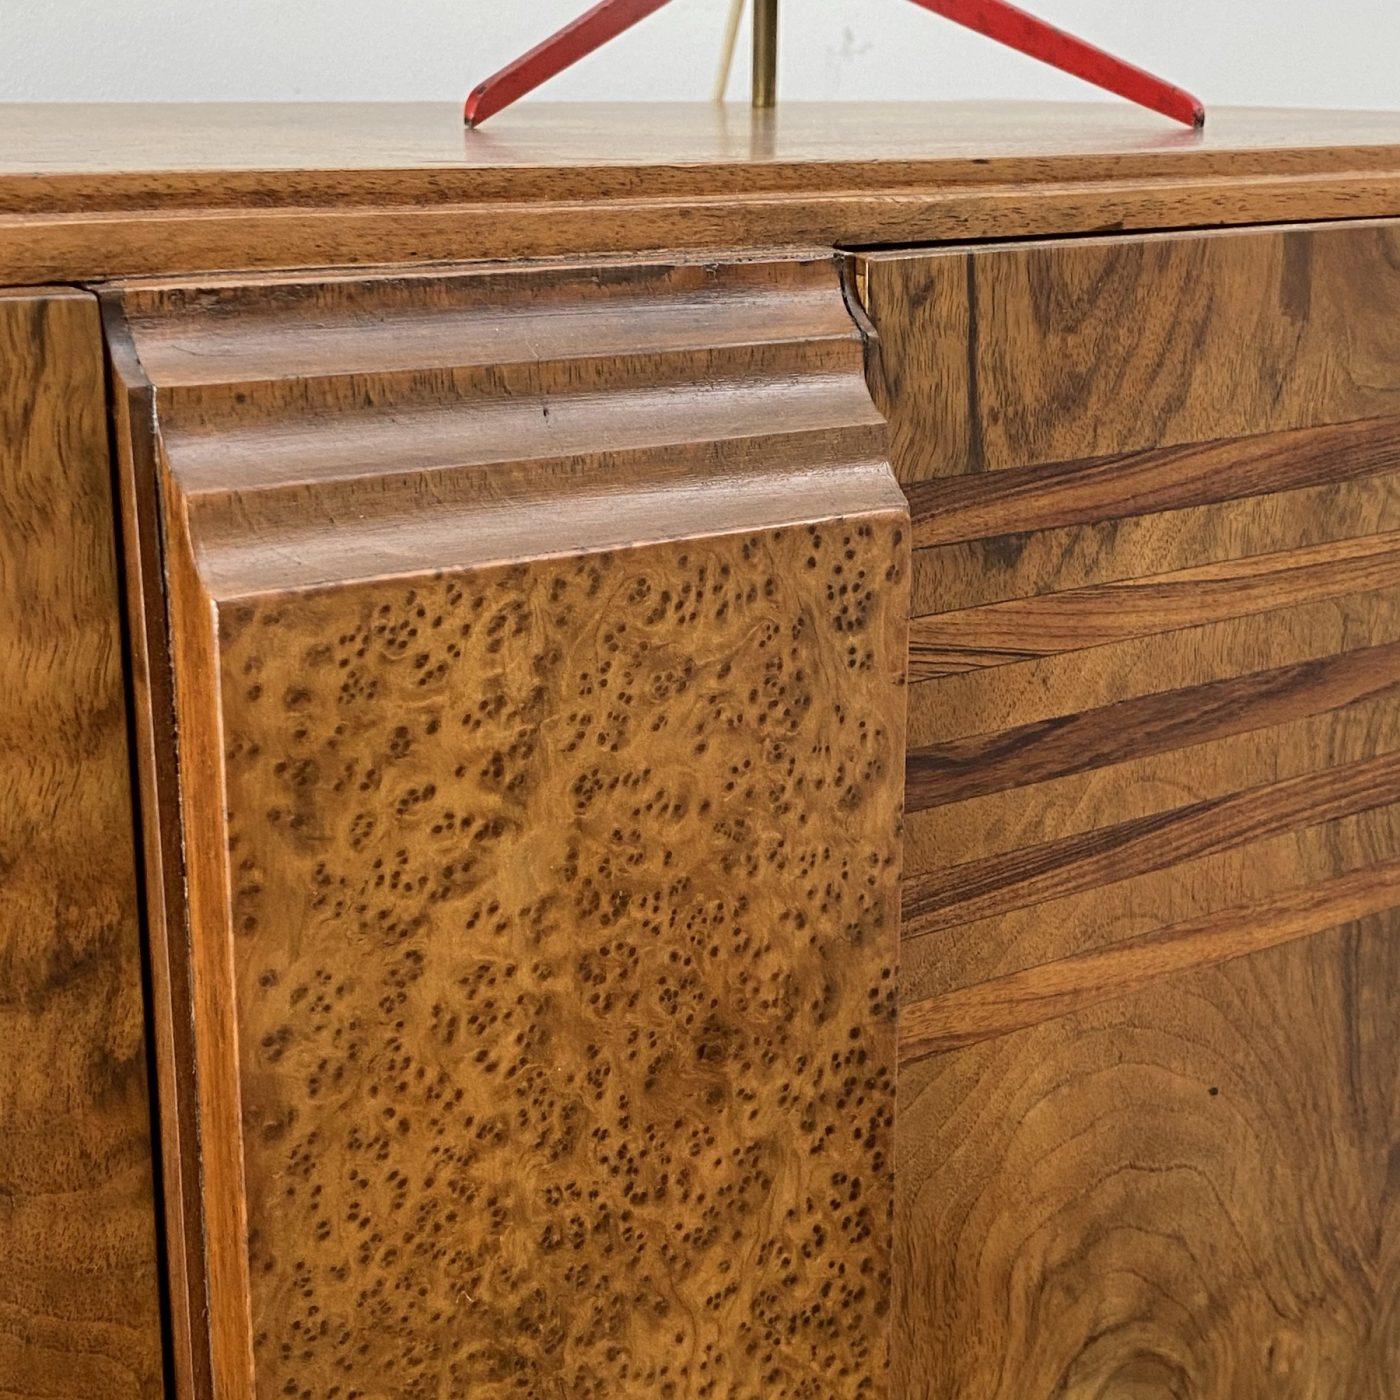 objet-vagabond-artdeco-cabinet0005